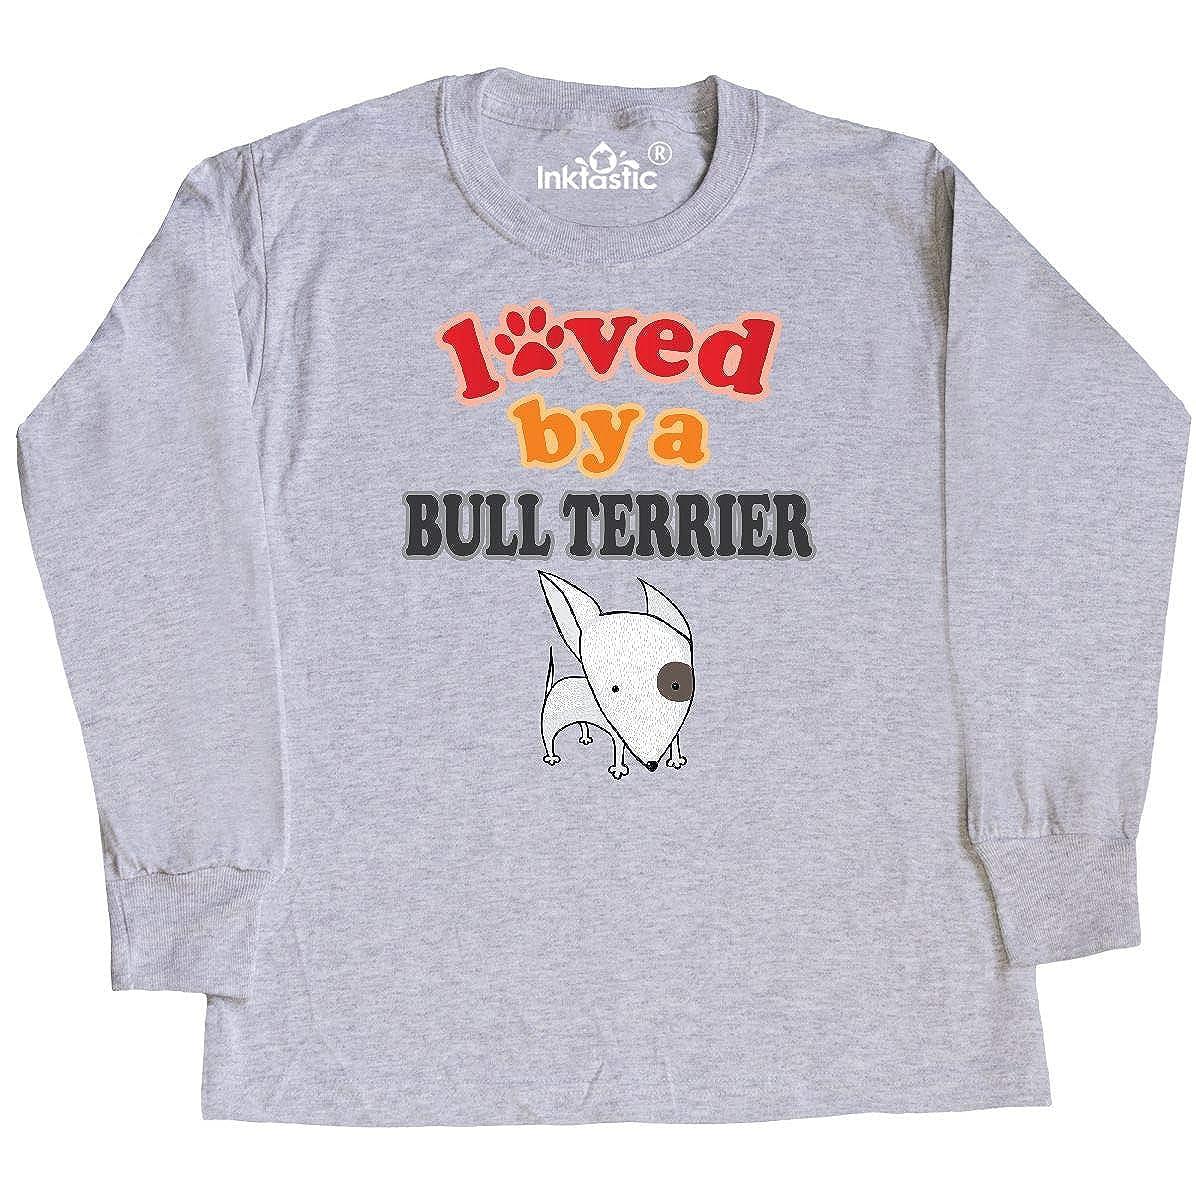 inktastic Bull Terrier Dog Puppy Baby T-Shirt